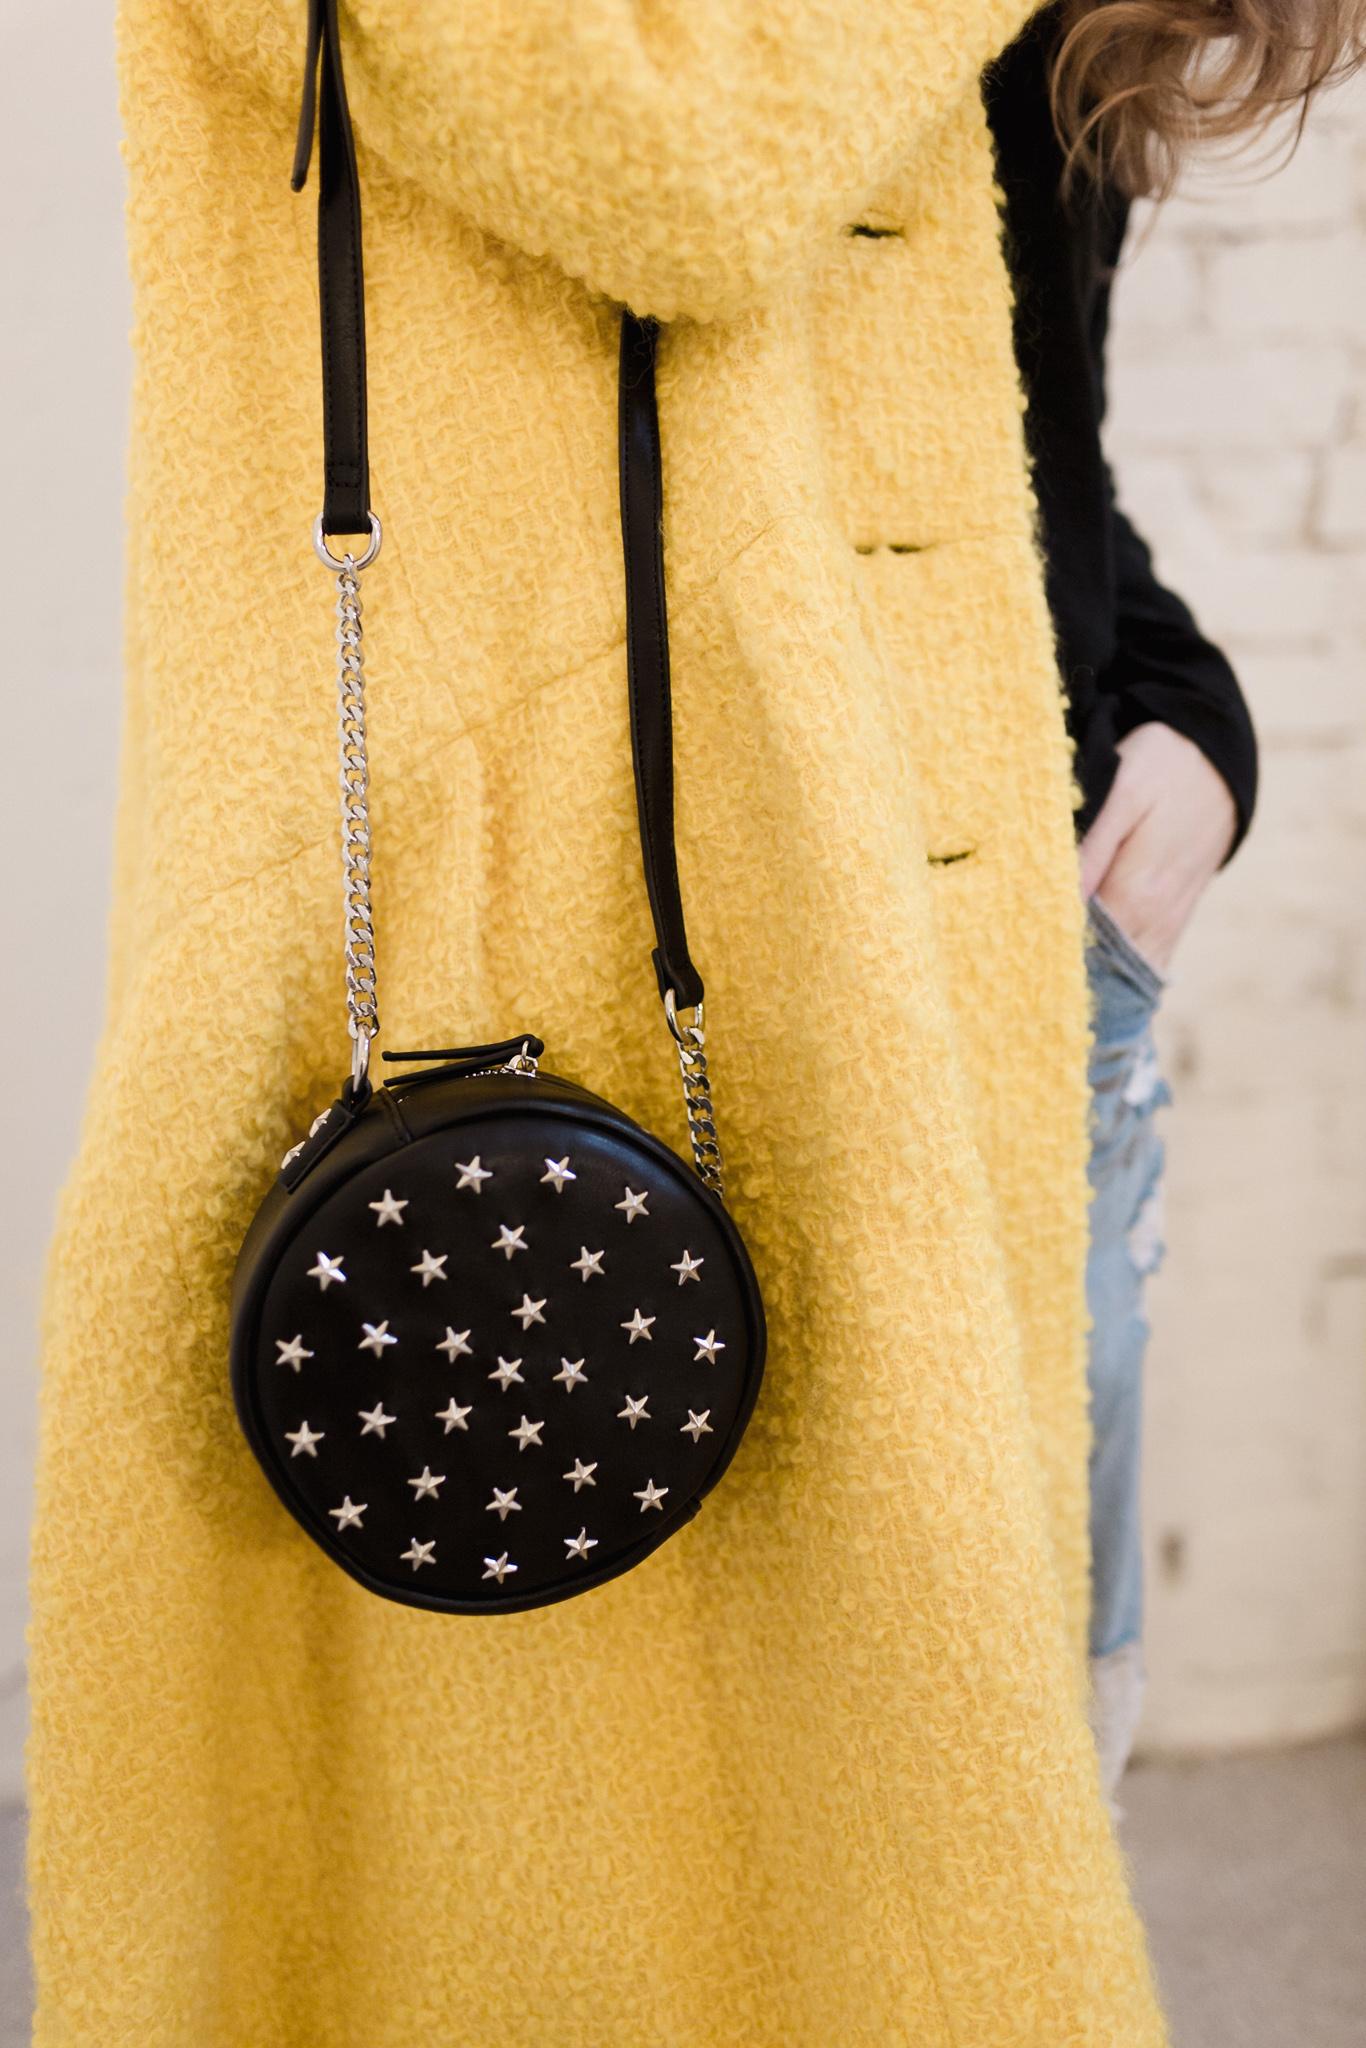 Eldridge Edit_Anna_E_Cottrell_Fashion_Blogger_Yellow_Vintage_Coat_Wrangler_Boyfriend_Jeans_Spring_Trend_2017_Star_Crossbody_Bag_Socks_with_Heels_Trend_MGB_Photo_14.jpg